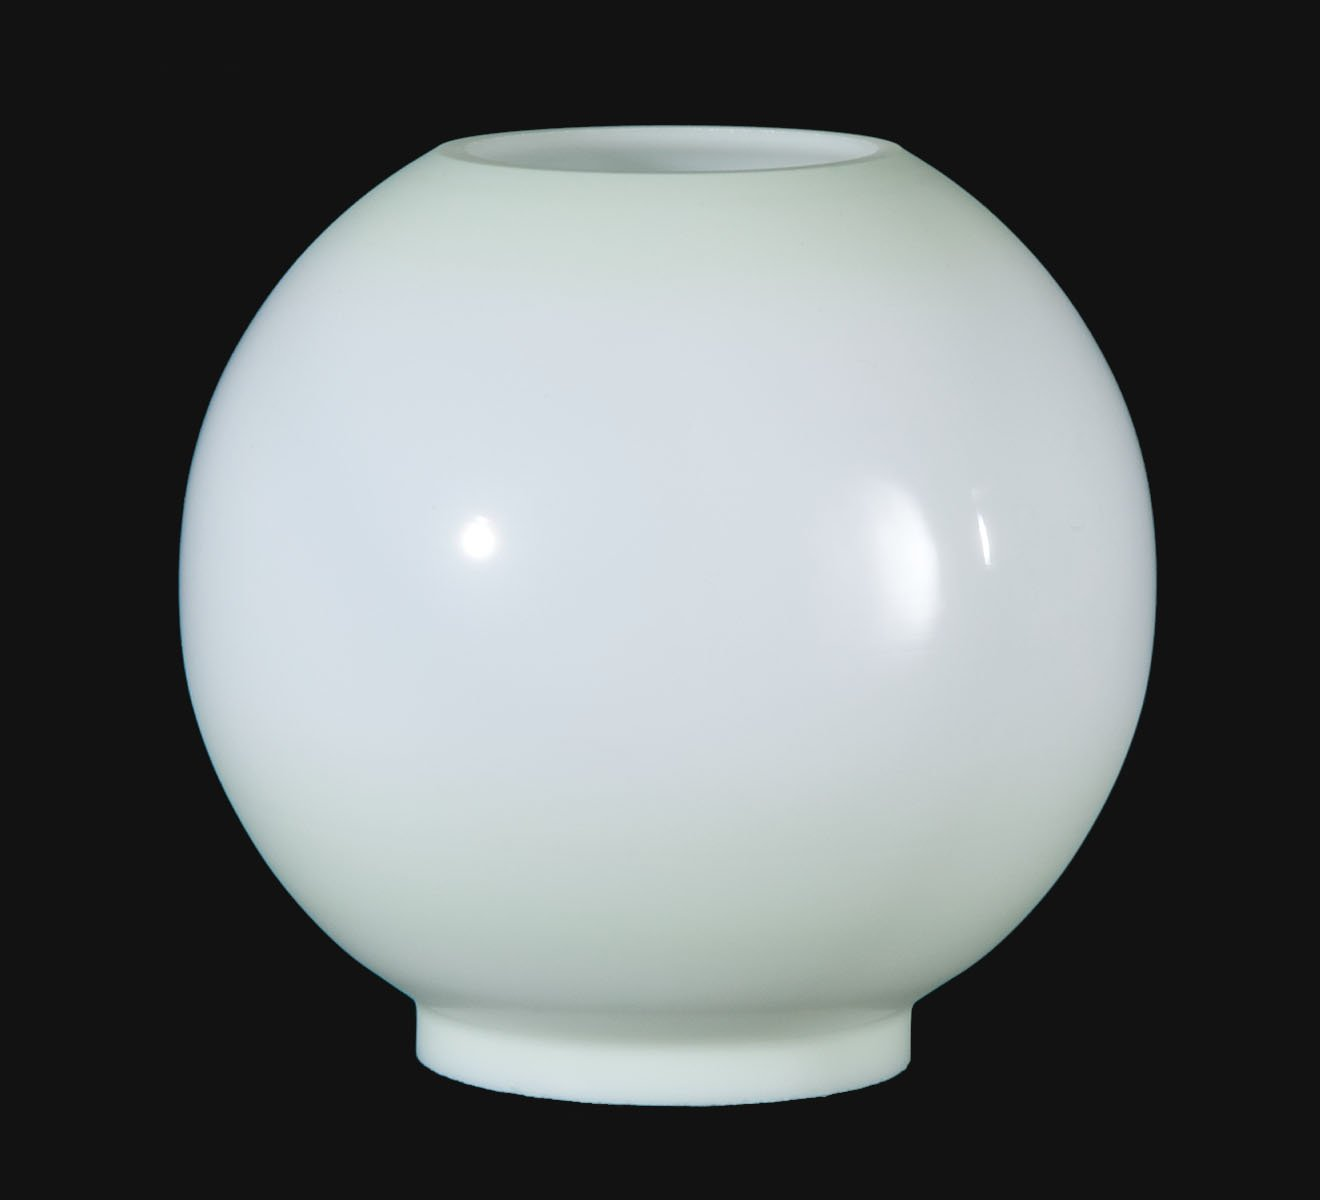 B&P Lamp Opal Glass Ball Shade, Celadon Tint by B&P Lamp